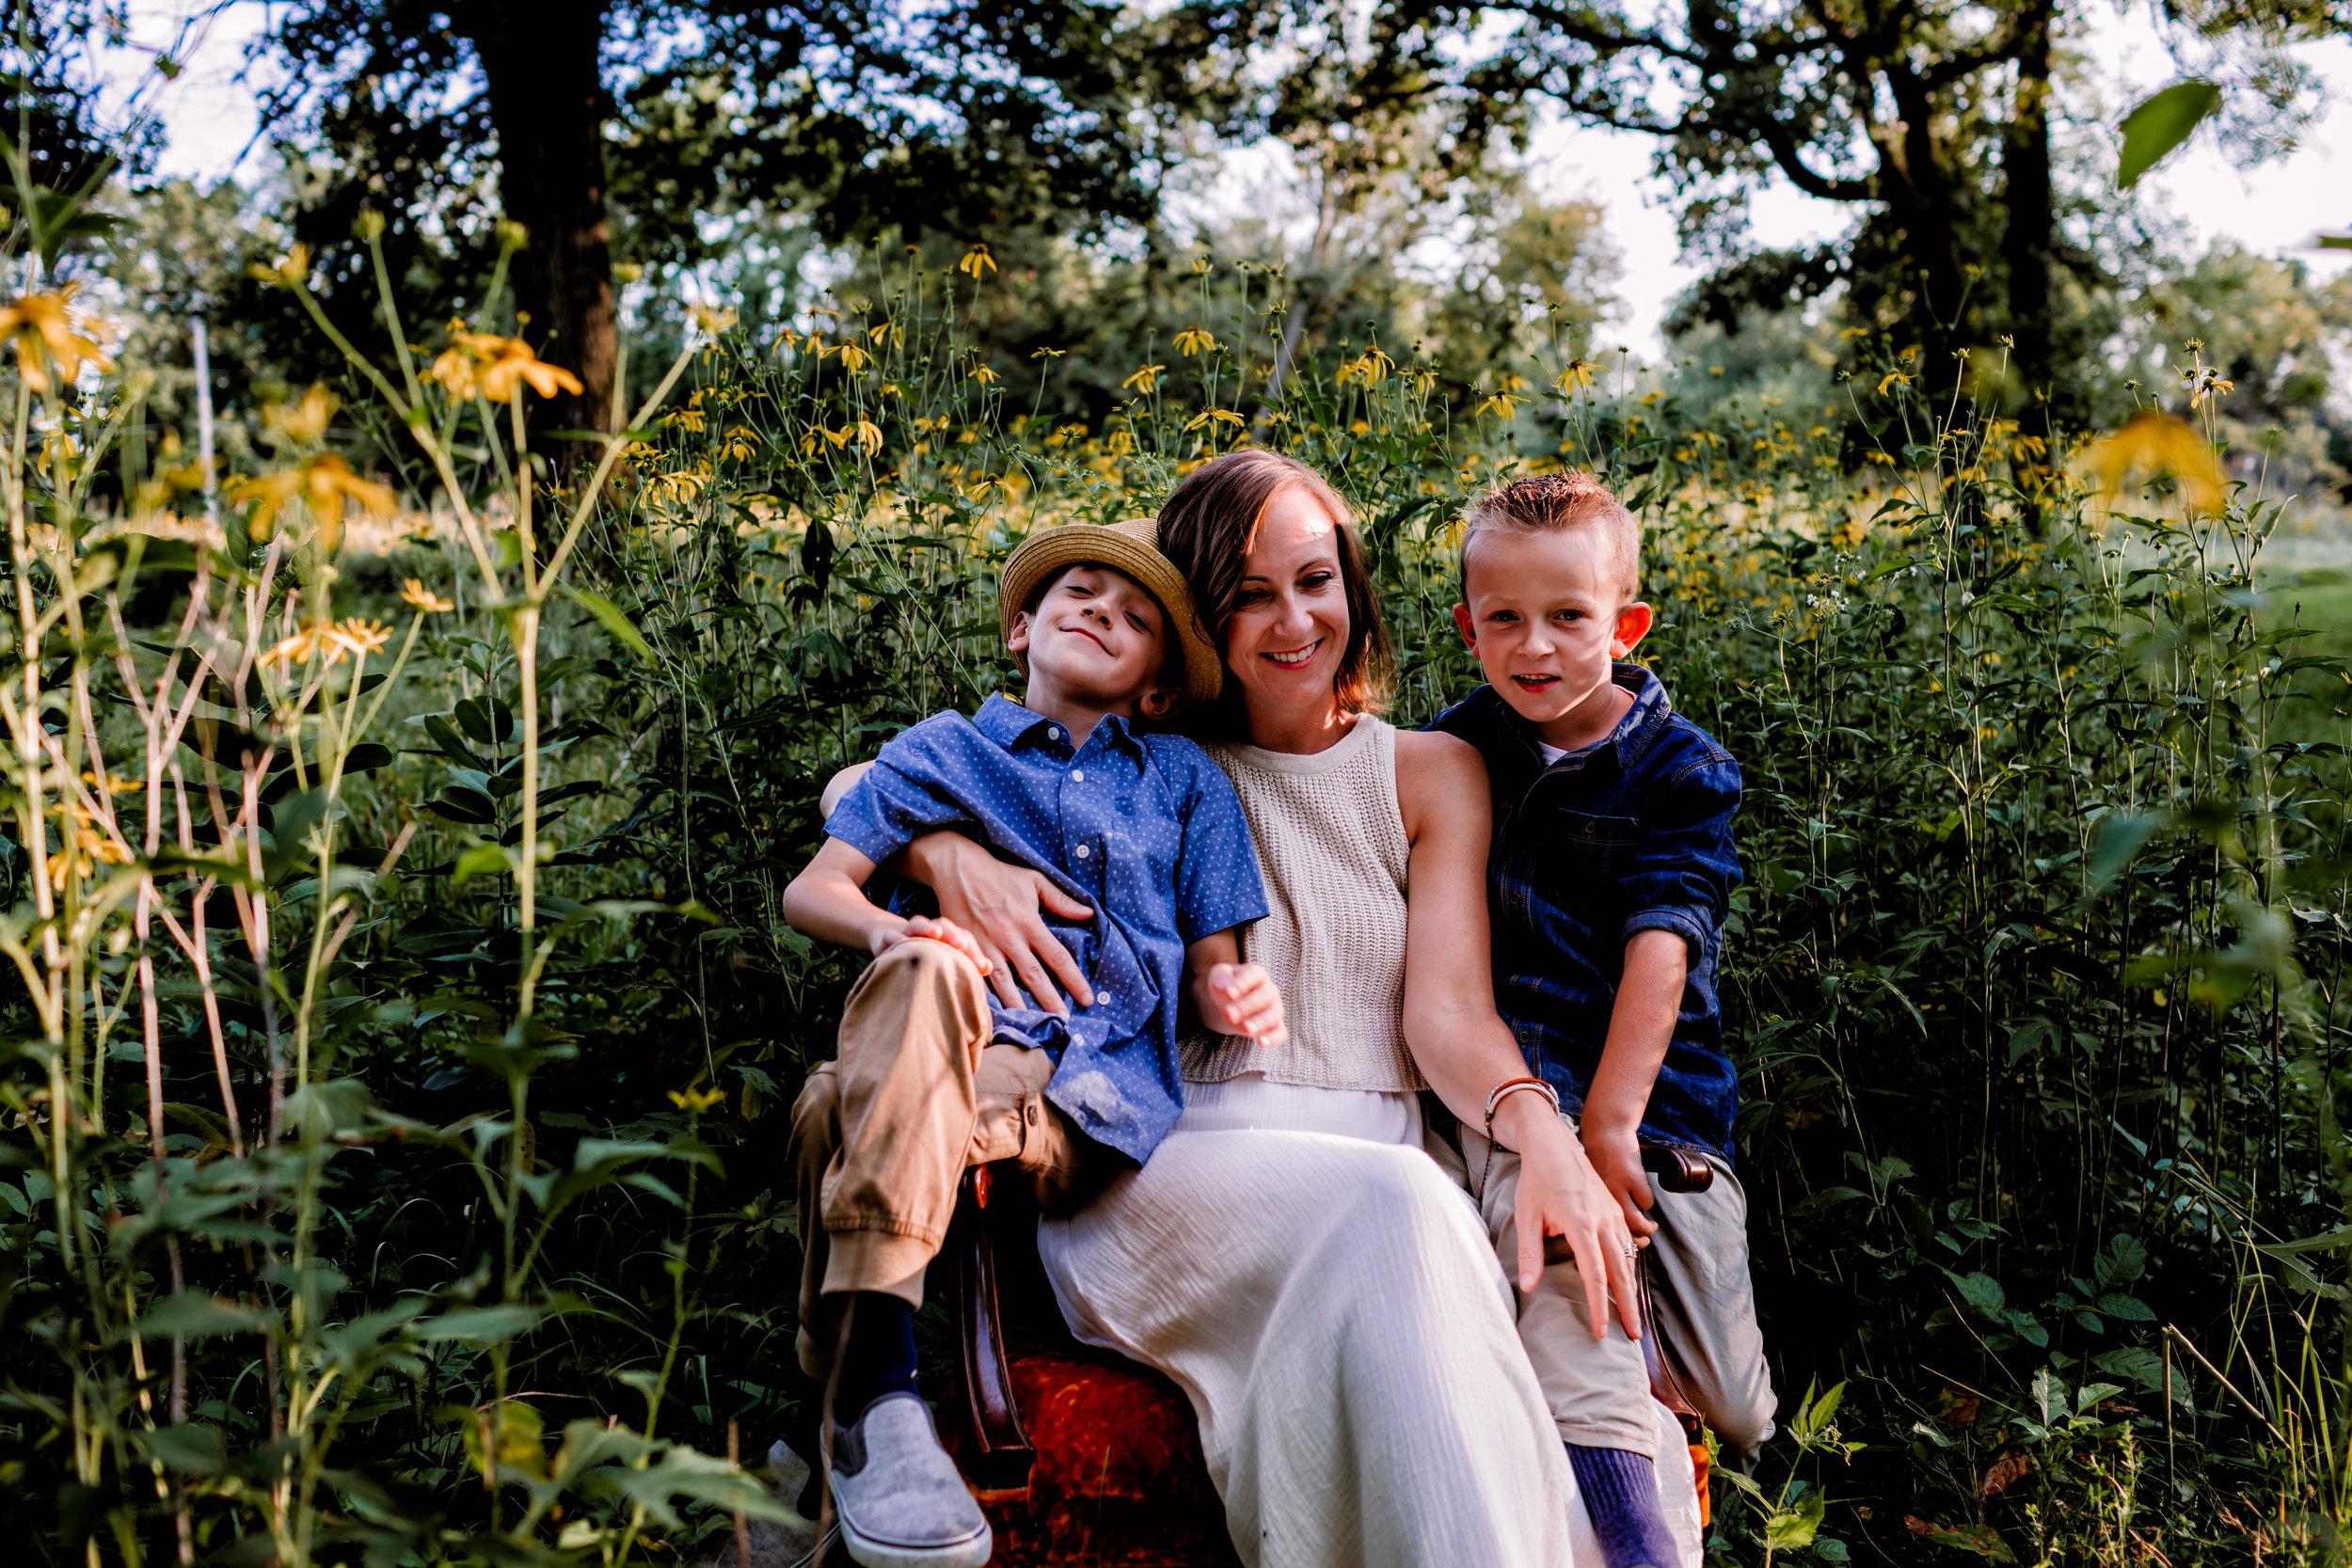 family-photography-austin-mn-minnesota-family-kids-photo-session-albert-lea-mn-rochester-mn-southern-minnesota-photographer-photography-pictures-outdoors